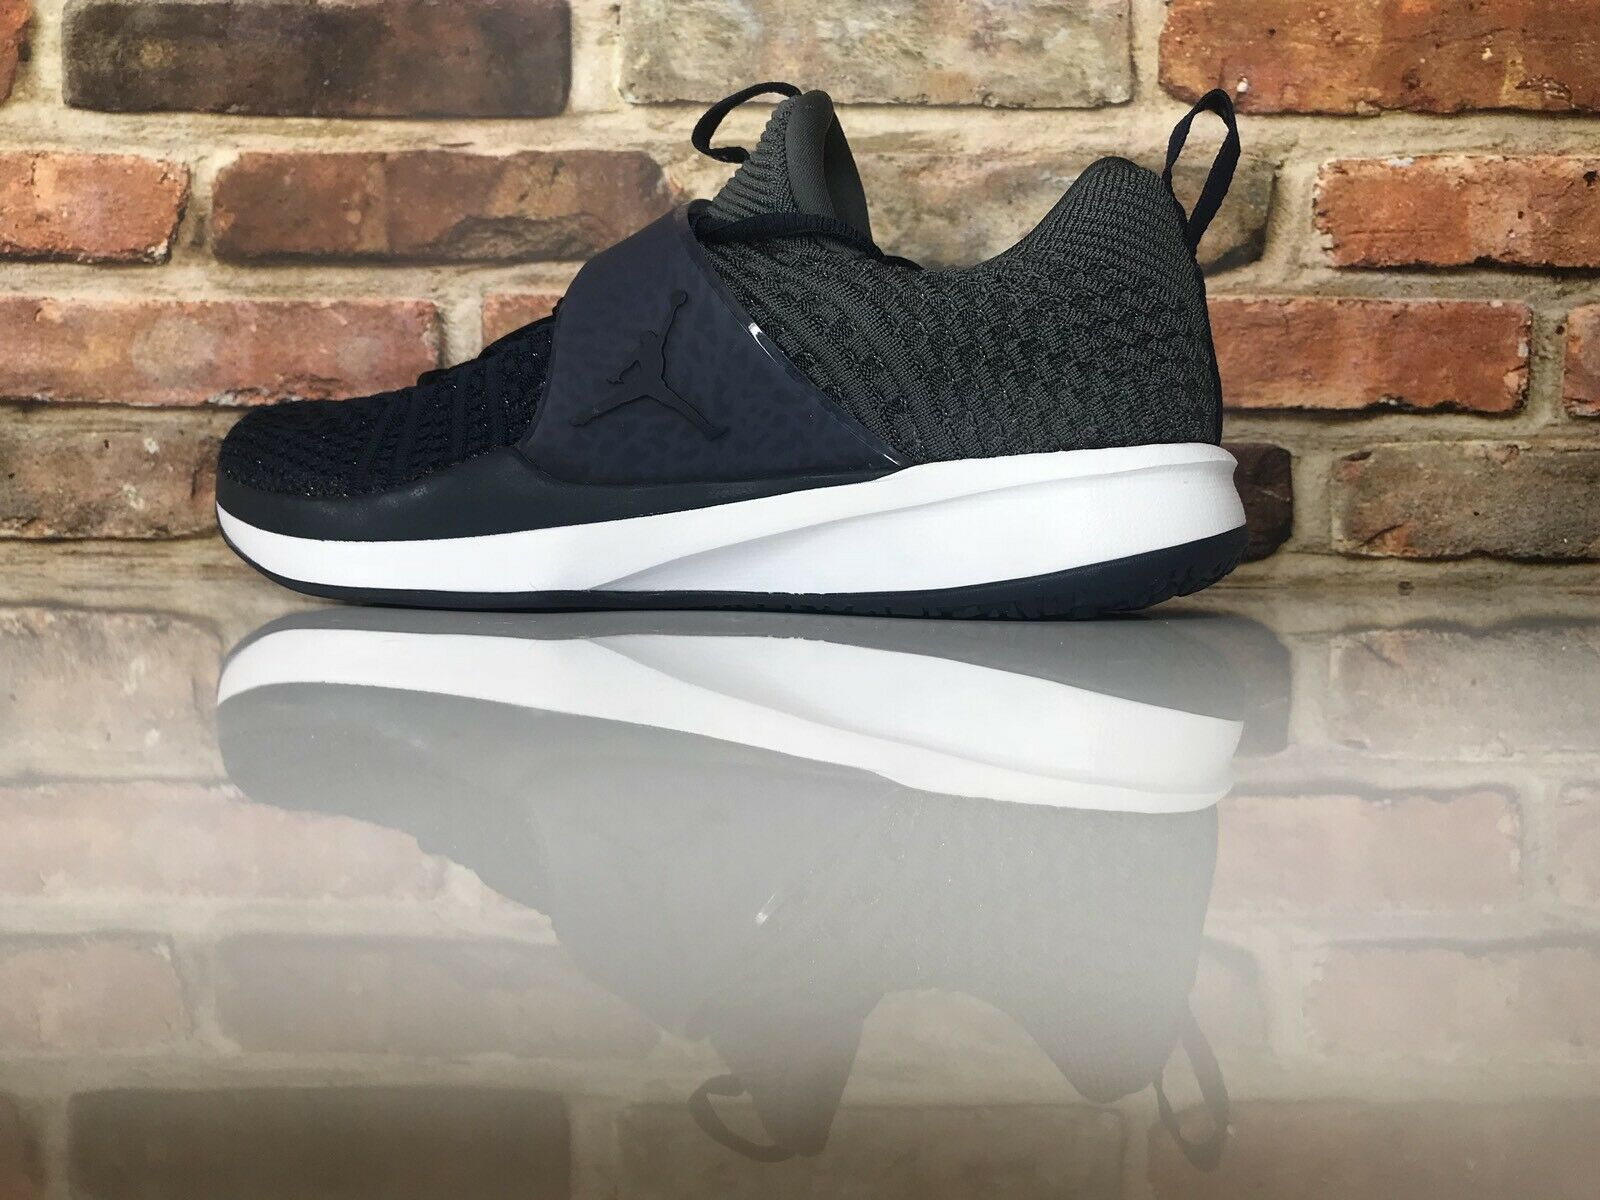 Nike Jordan Trainer 2 Flyknit RE2PECT Jeter Yankees shoes 921210-405 Men Size 10